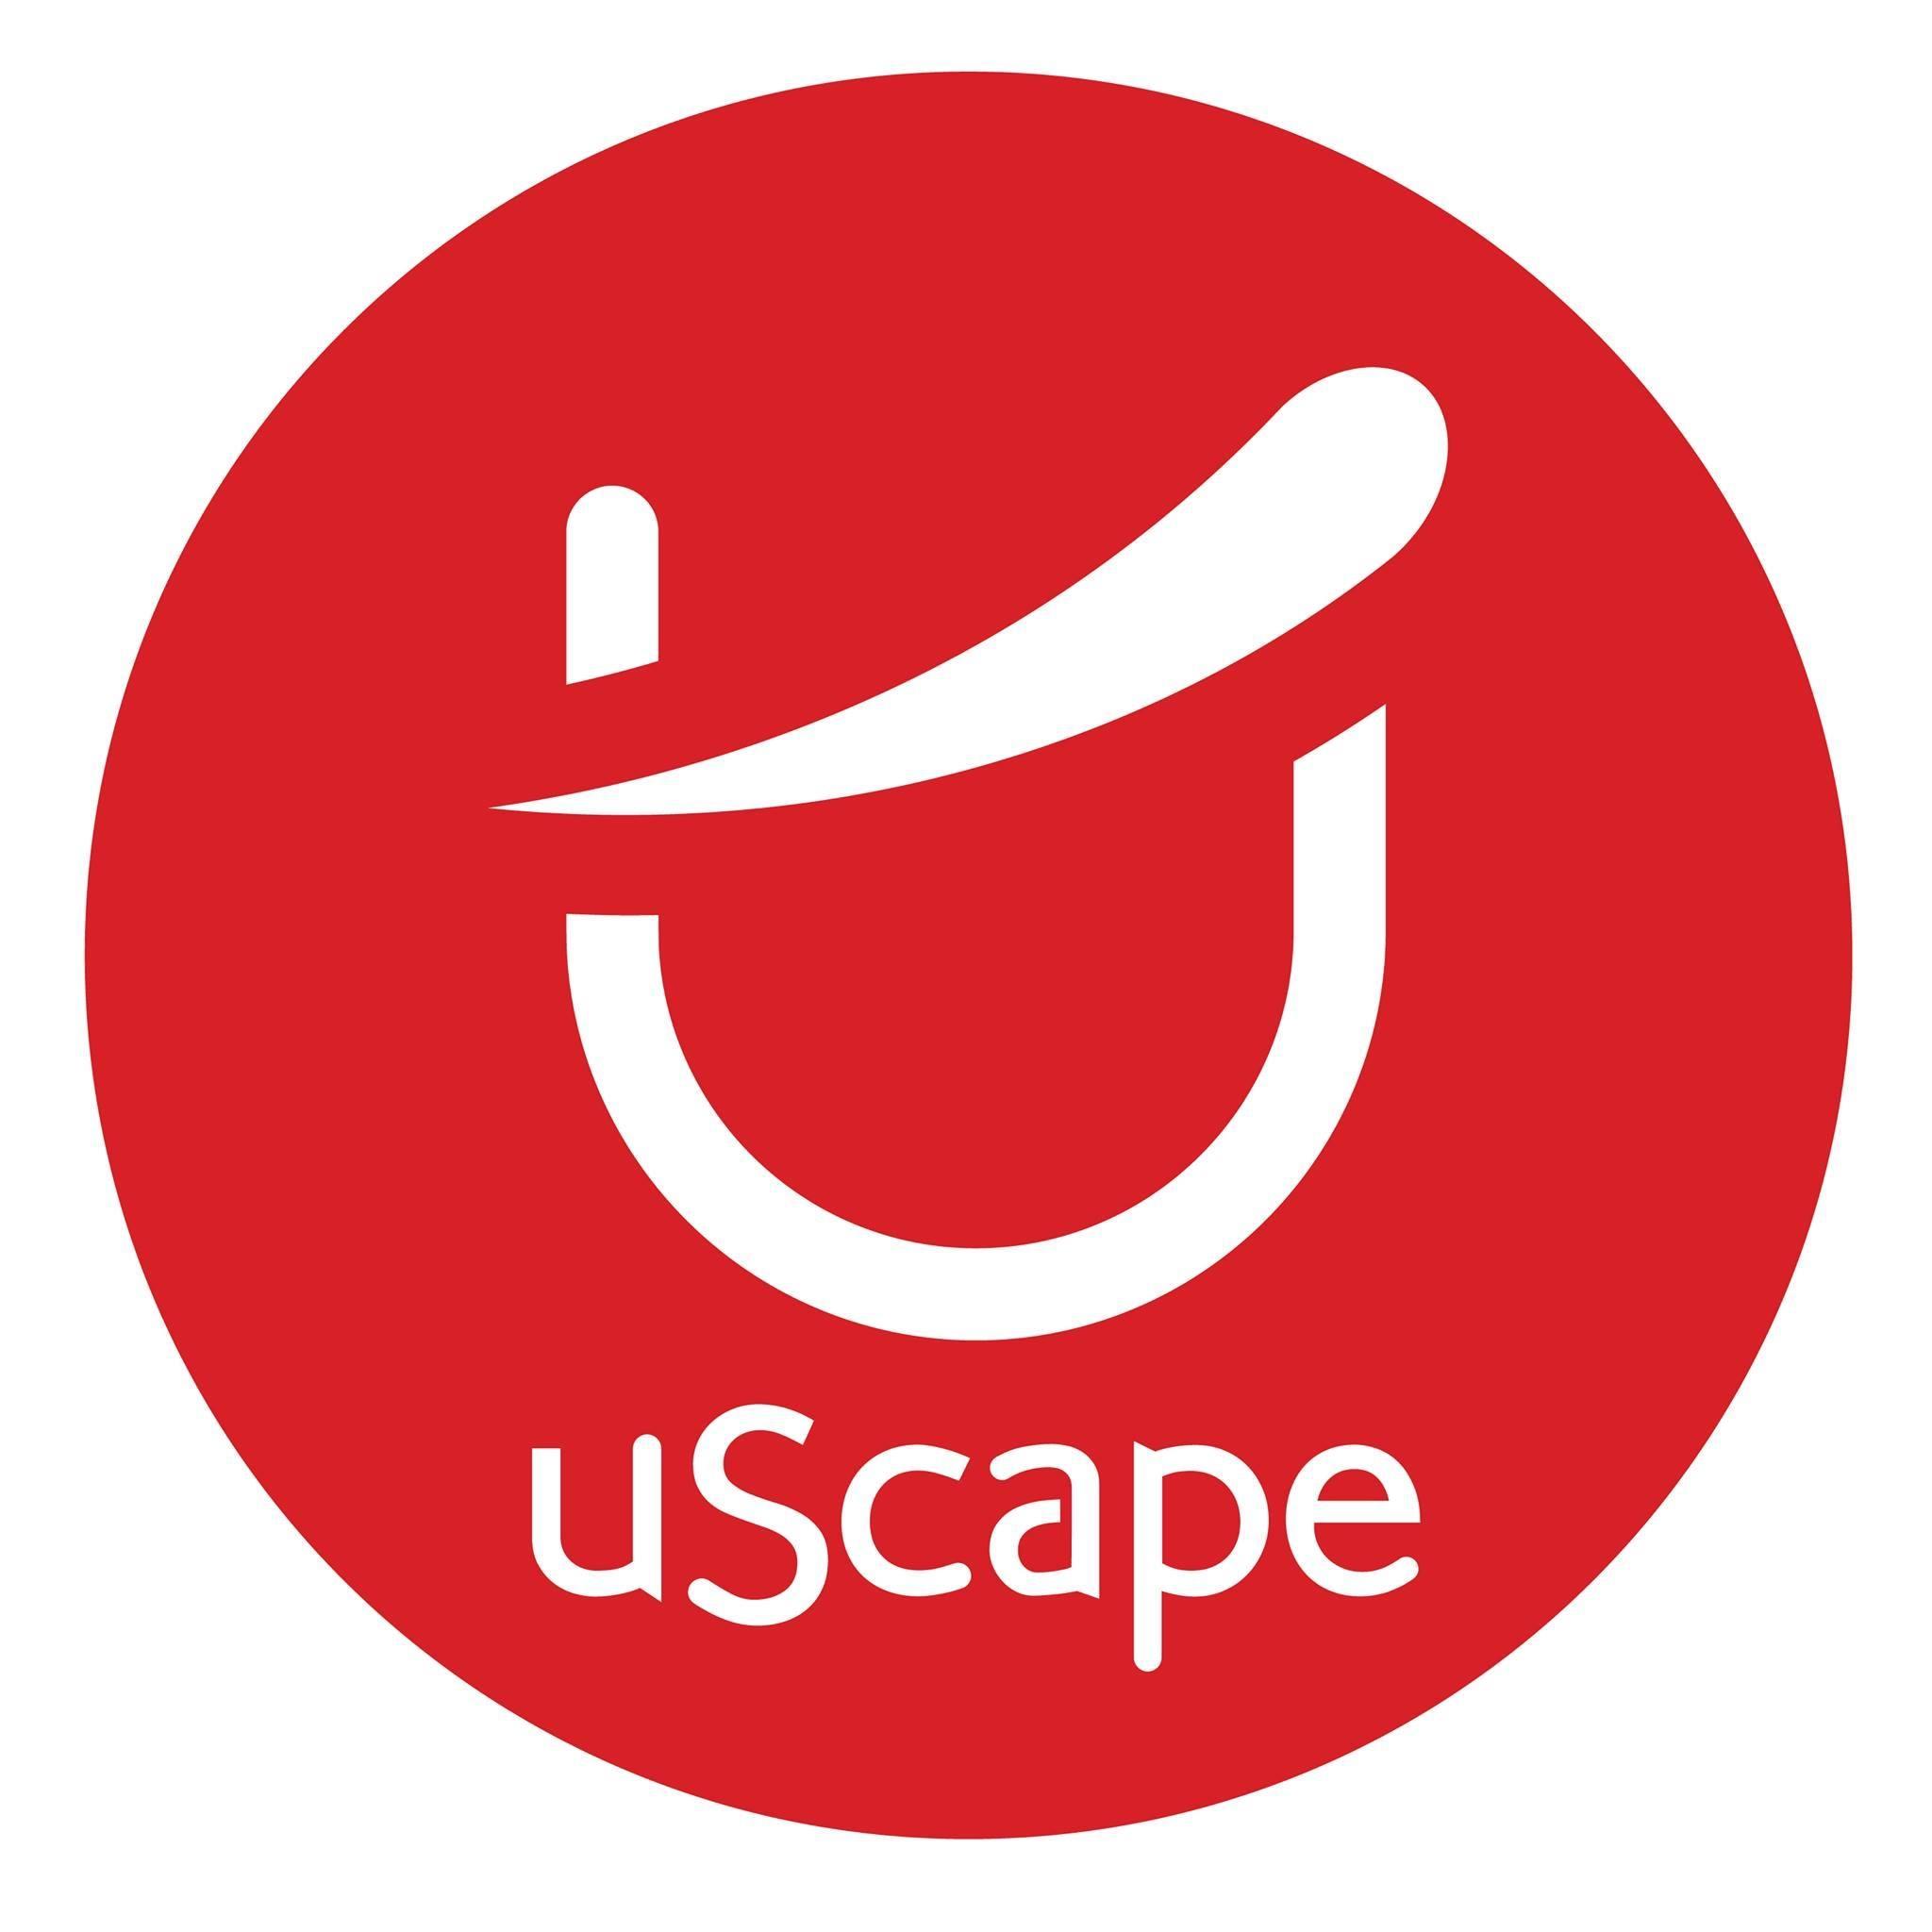 USCAPE-LOGO.jpg